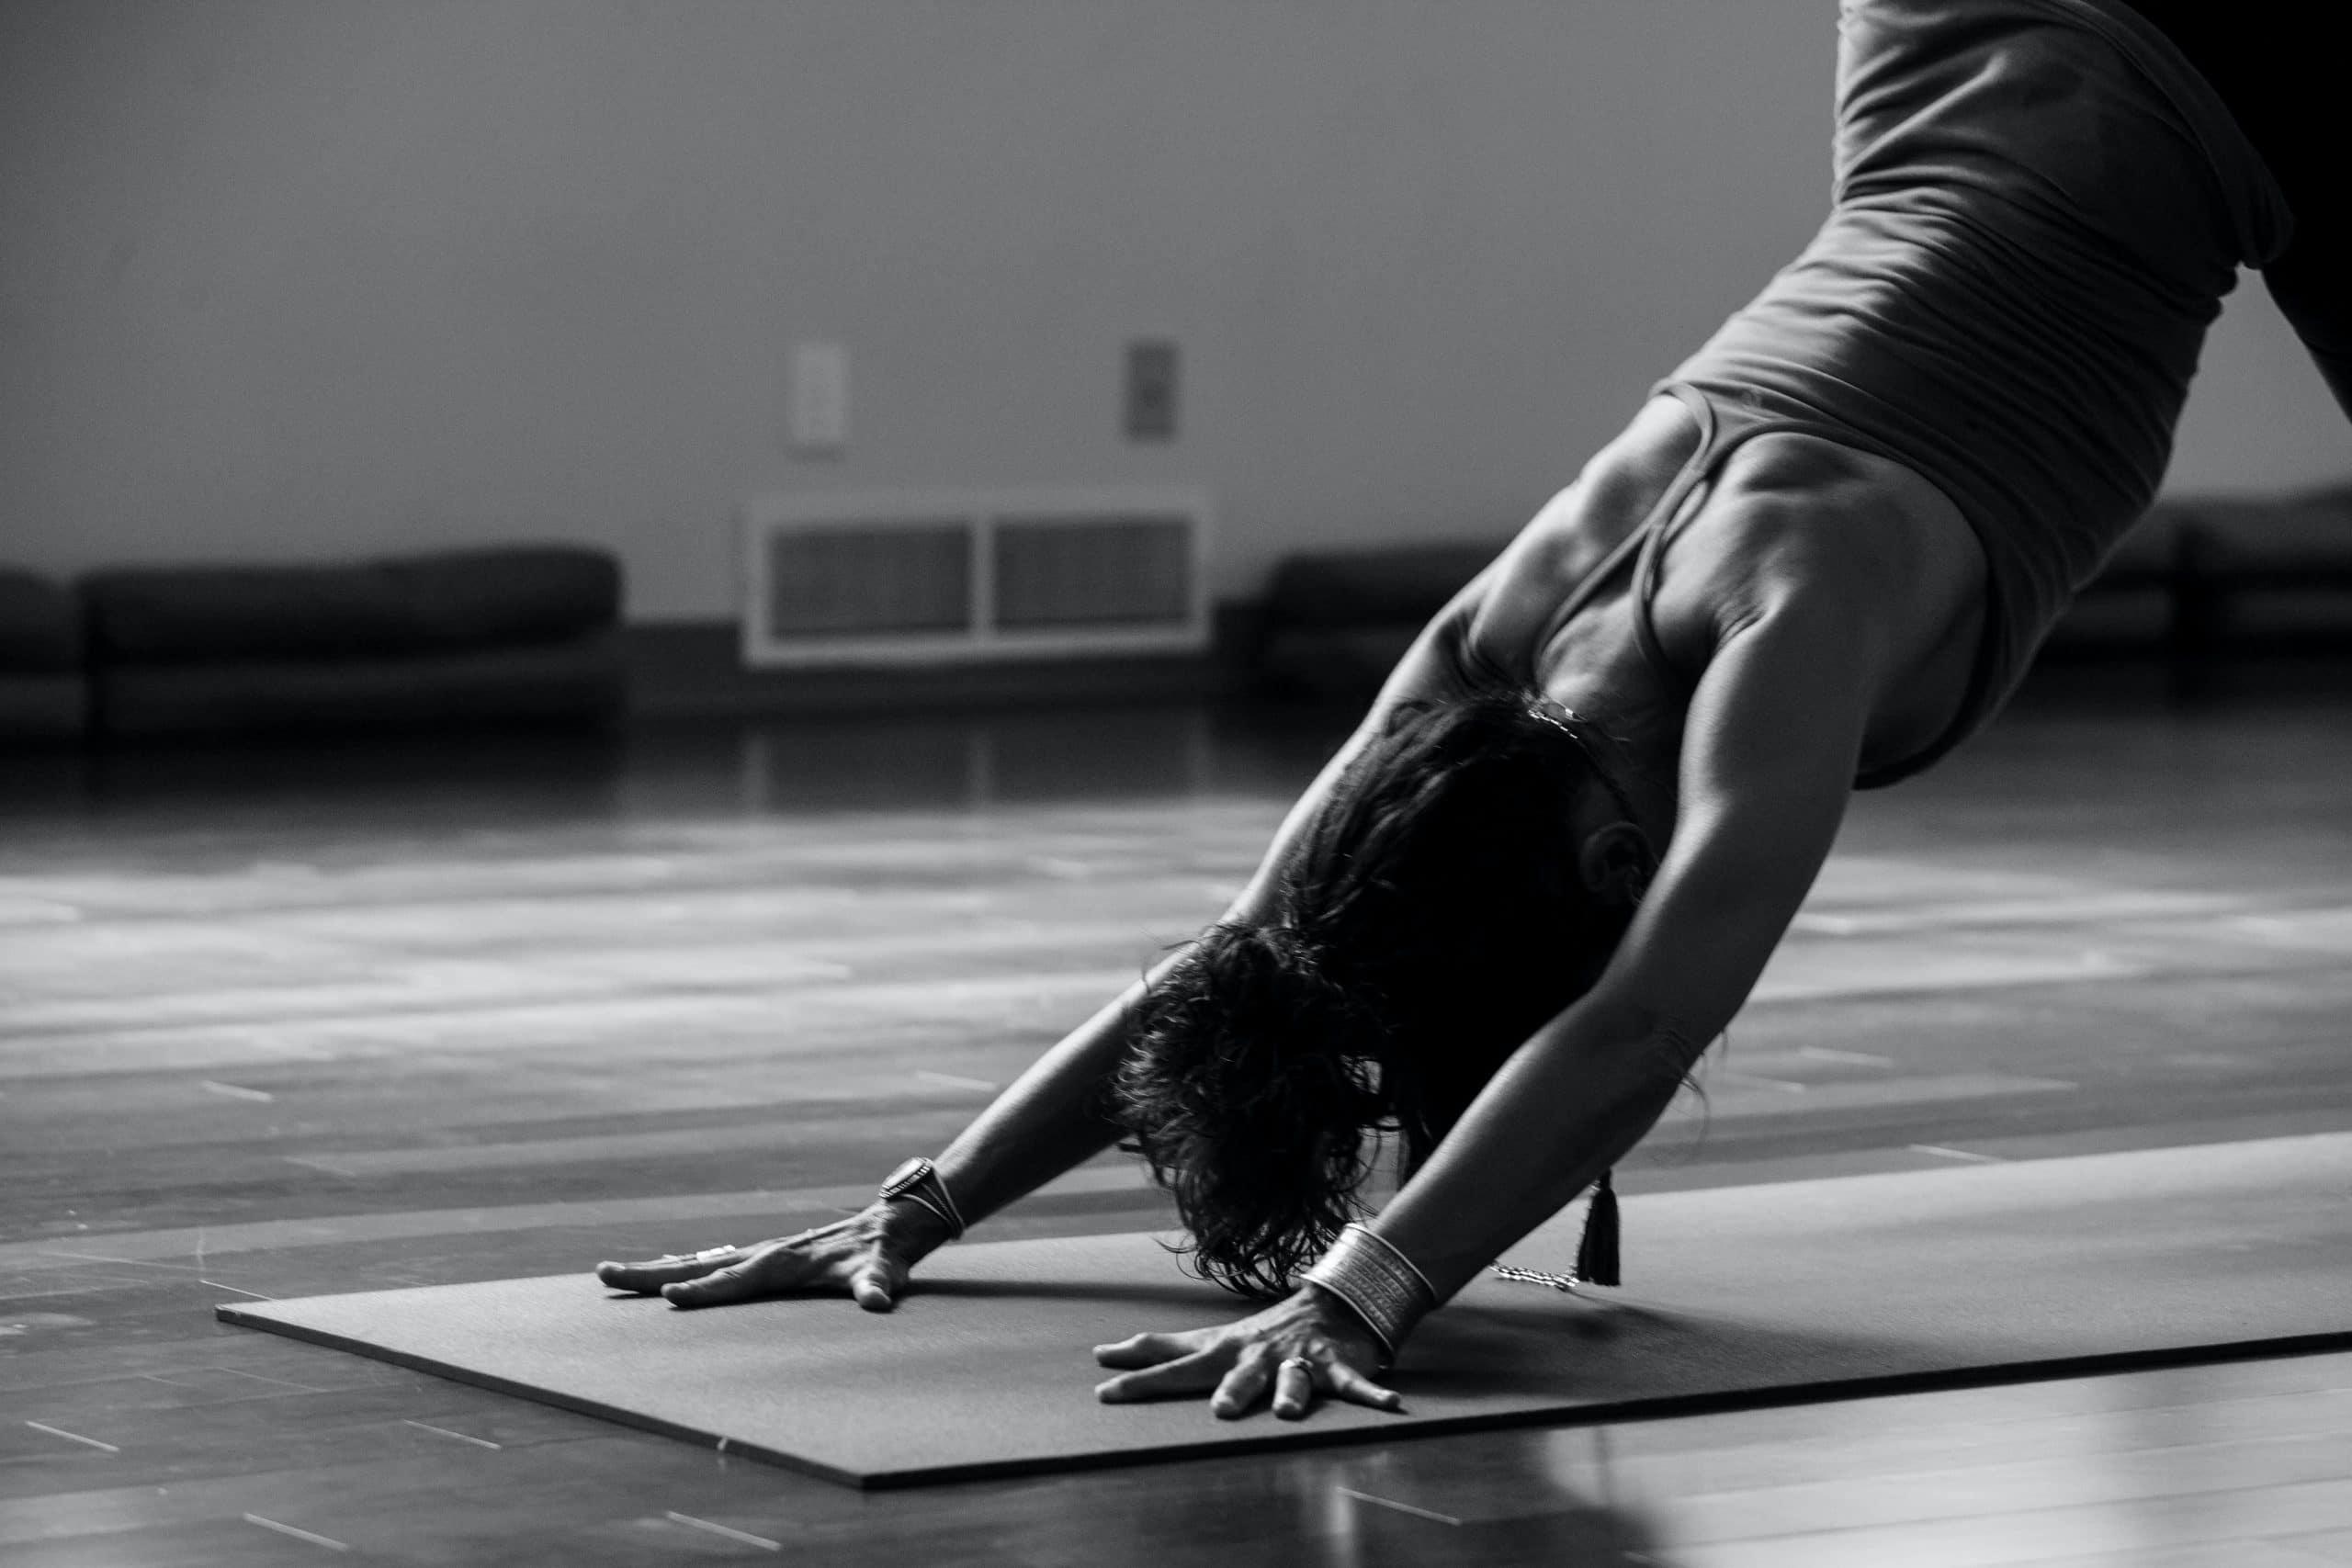 Frau schwarz weiß Yoga Pose auf Matte in Studio